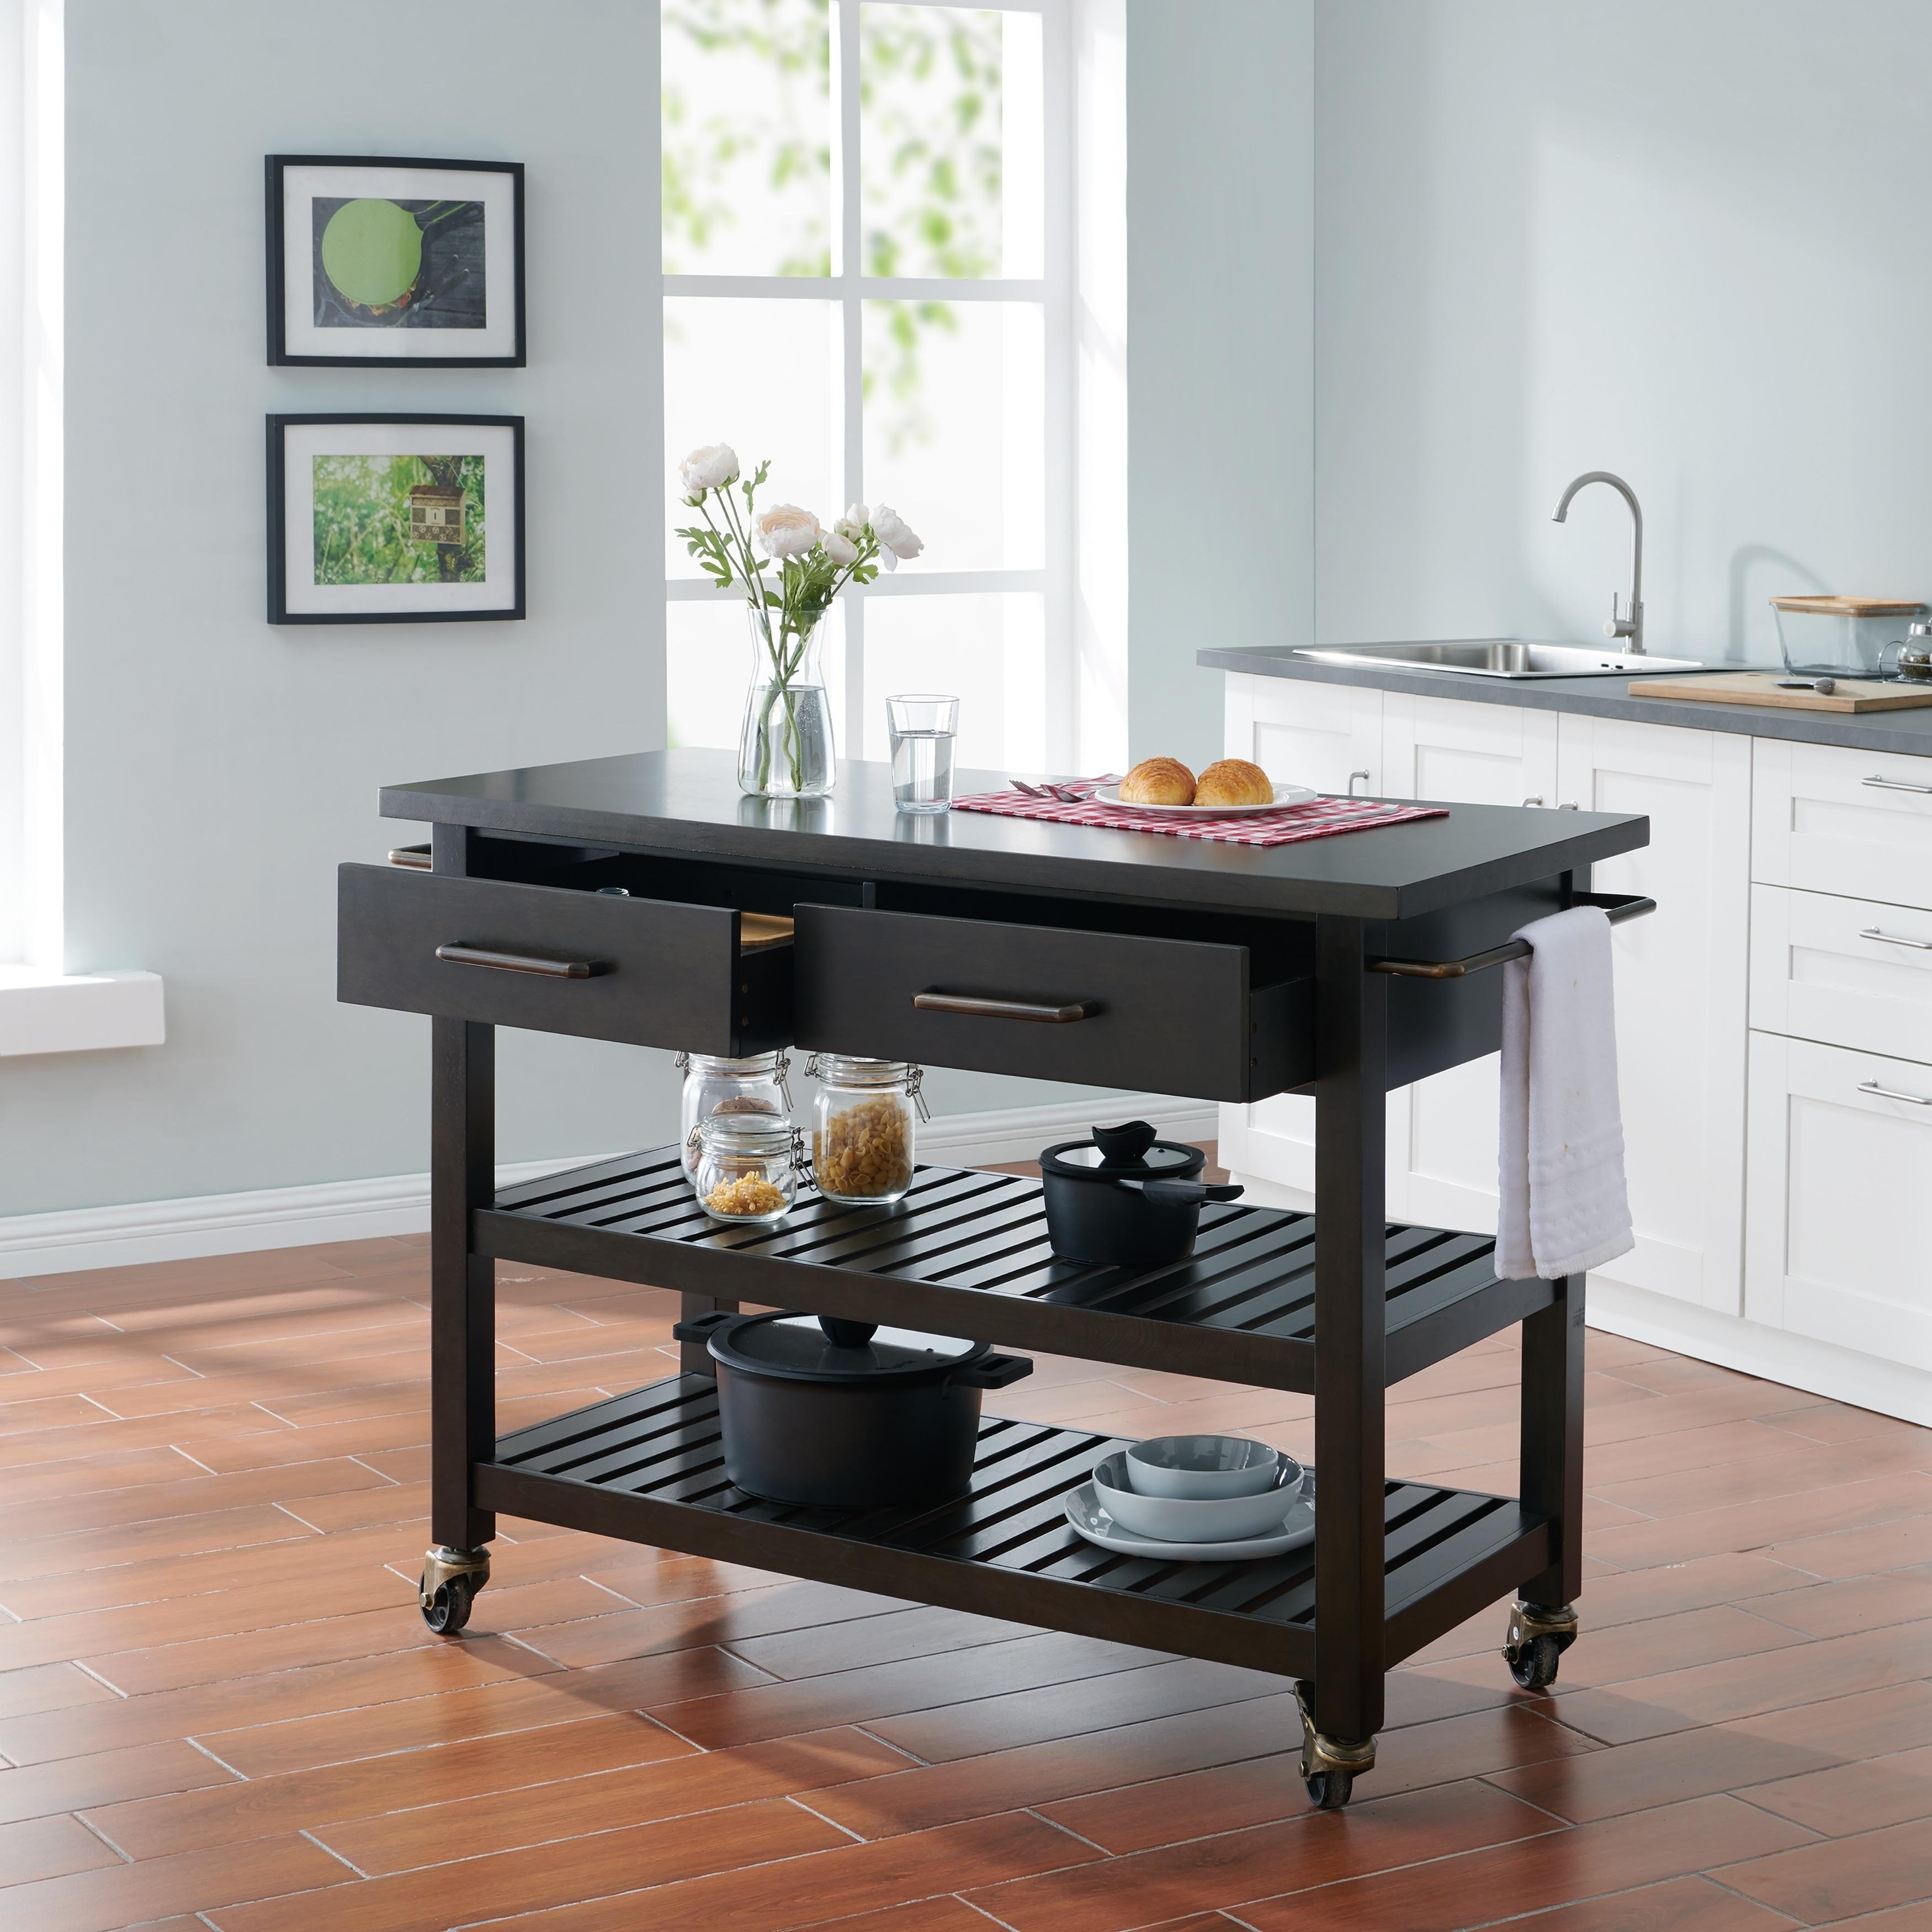 Holly Martin Havelock Modern Farmhouse Rolling Kitchen Island Overstock 28901084